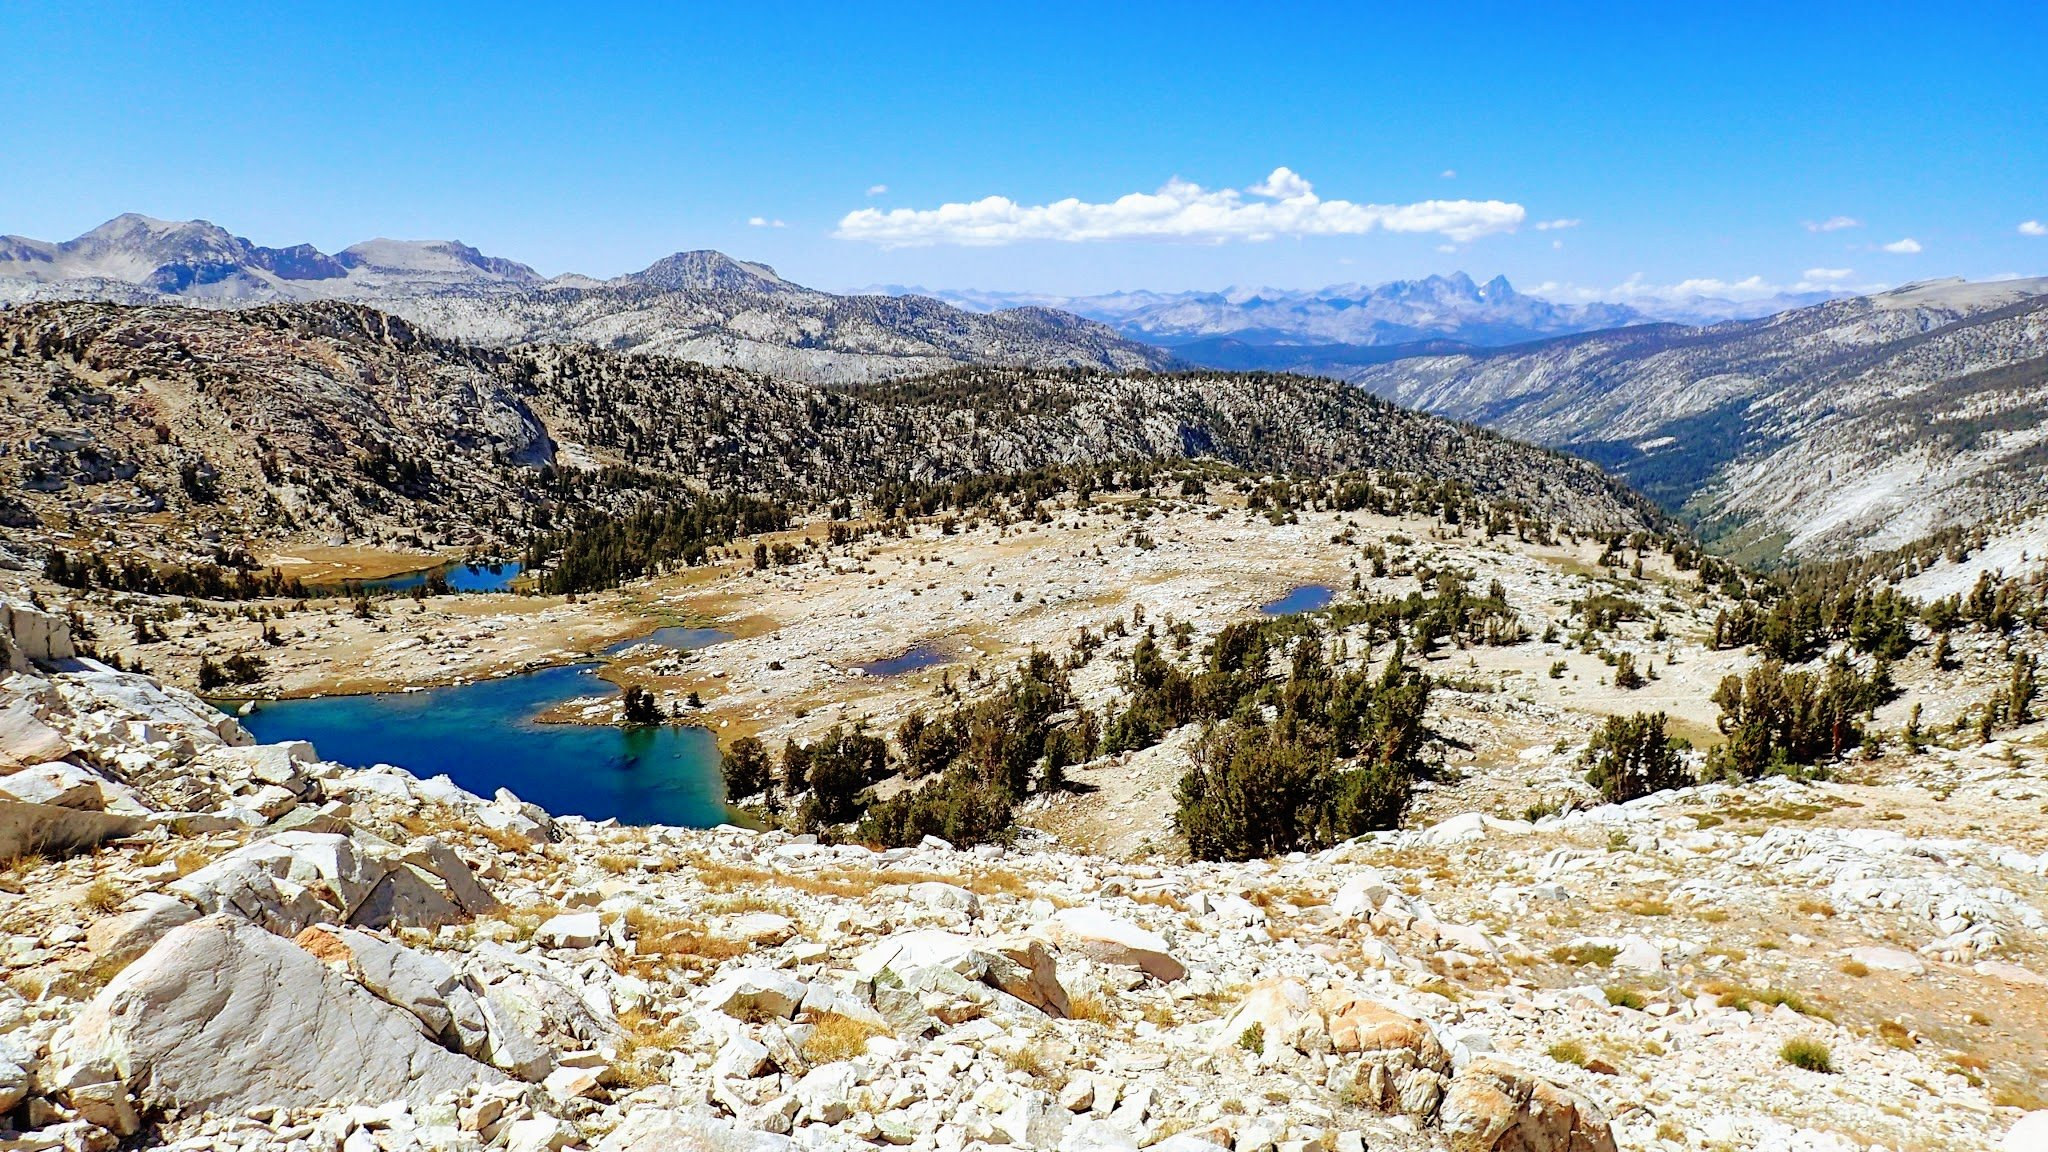 View of granite basins and lakes on John Muir Trail